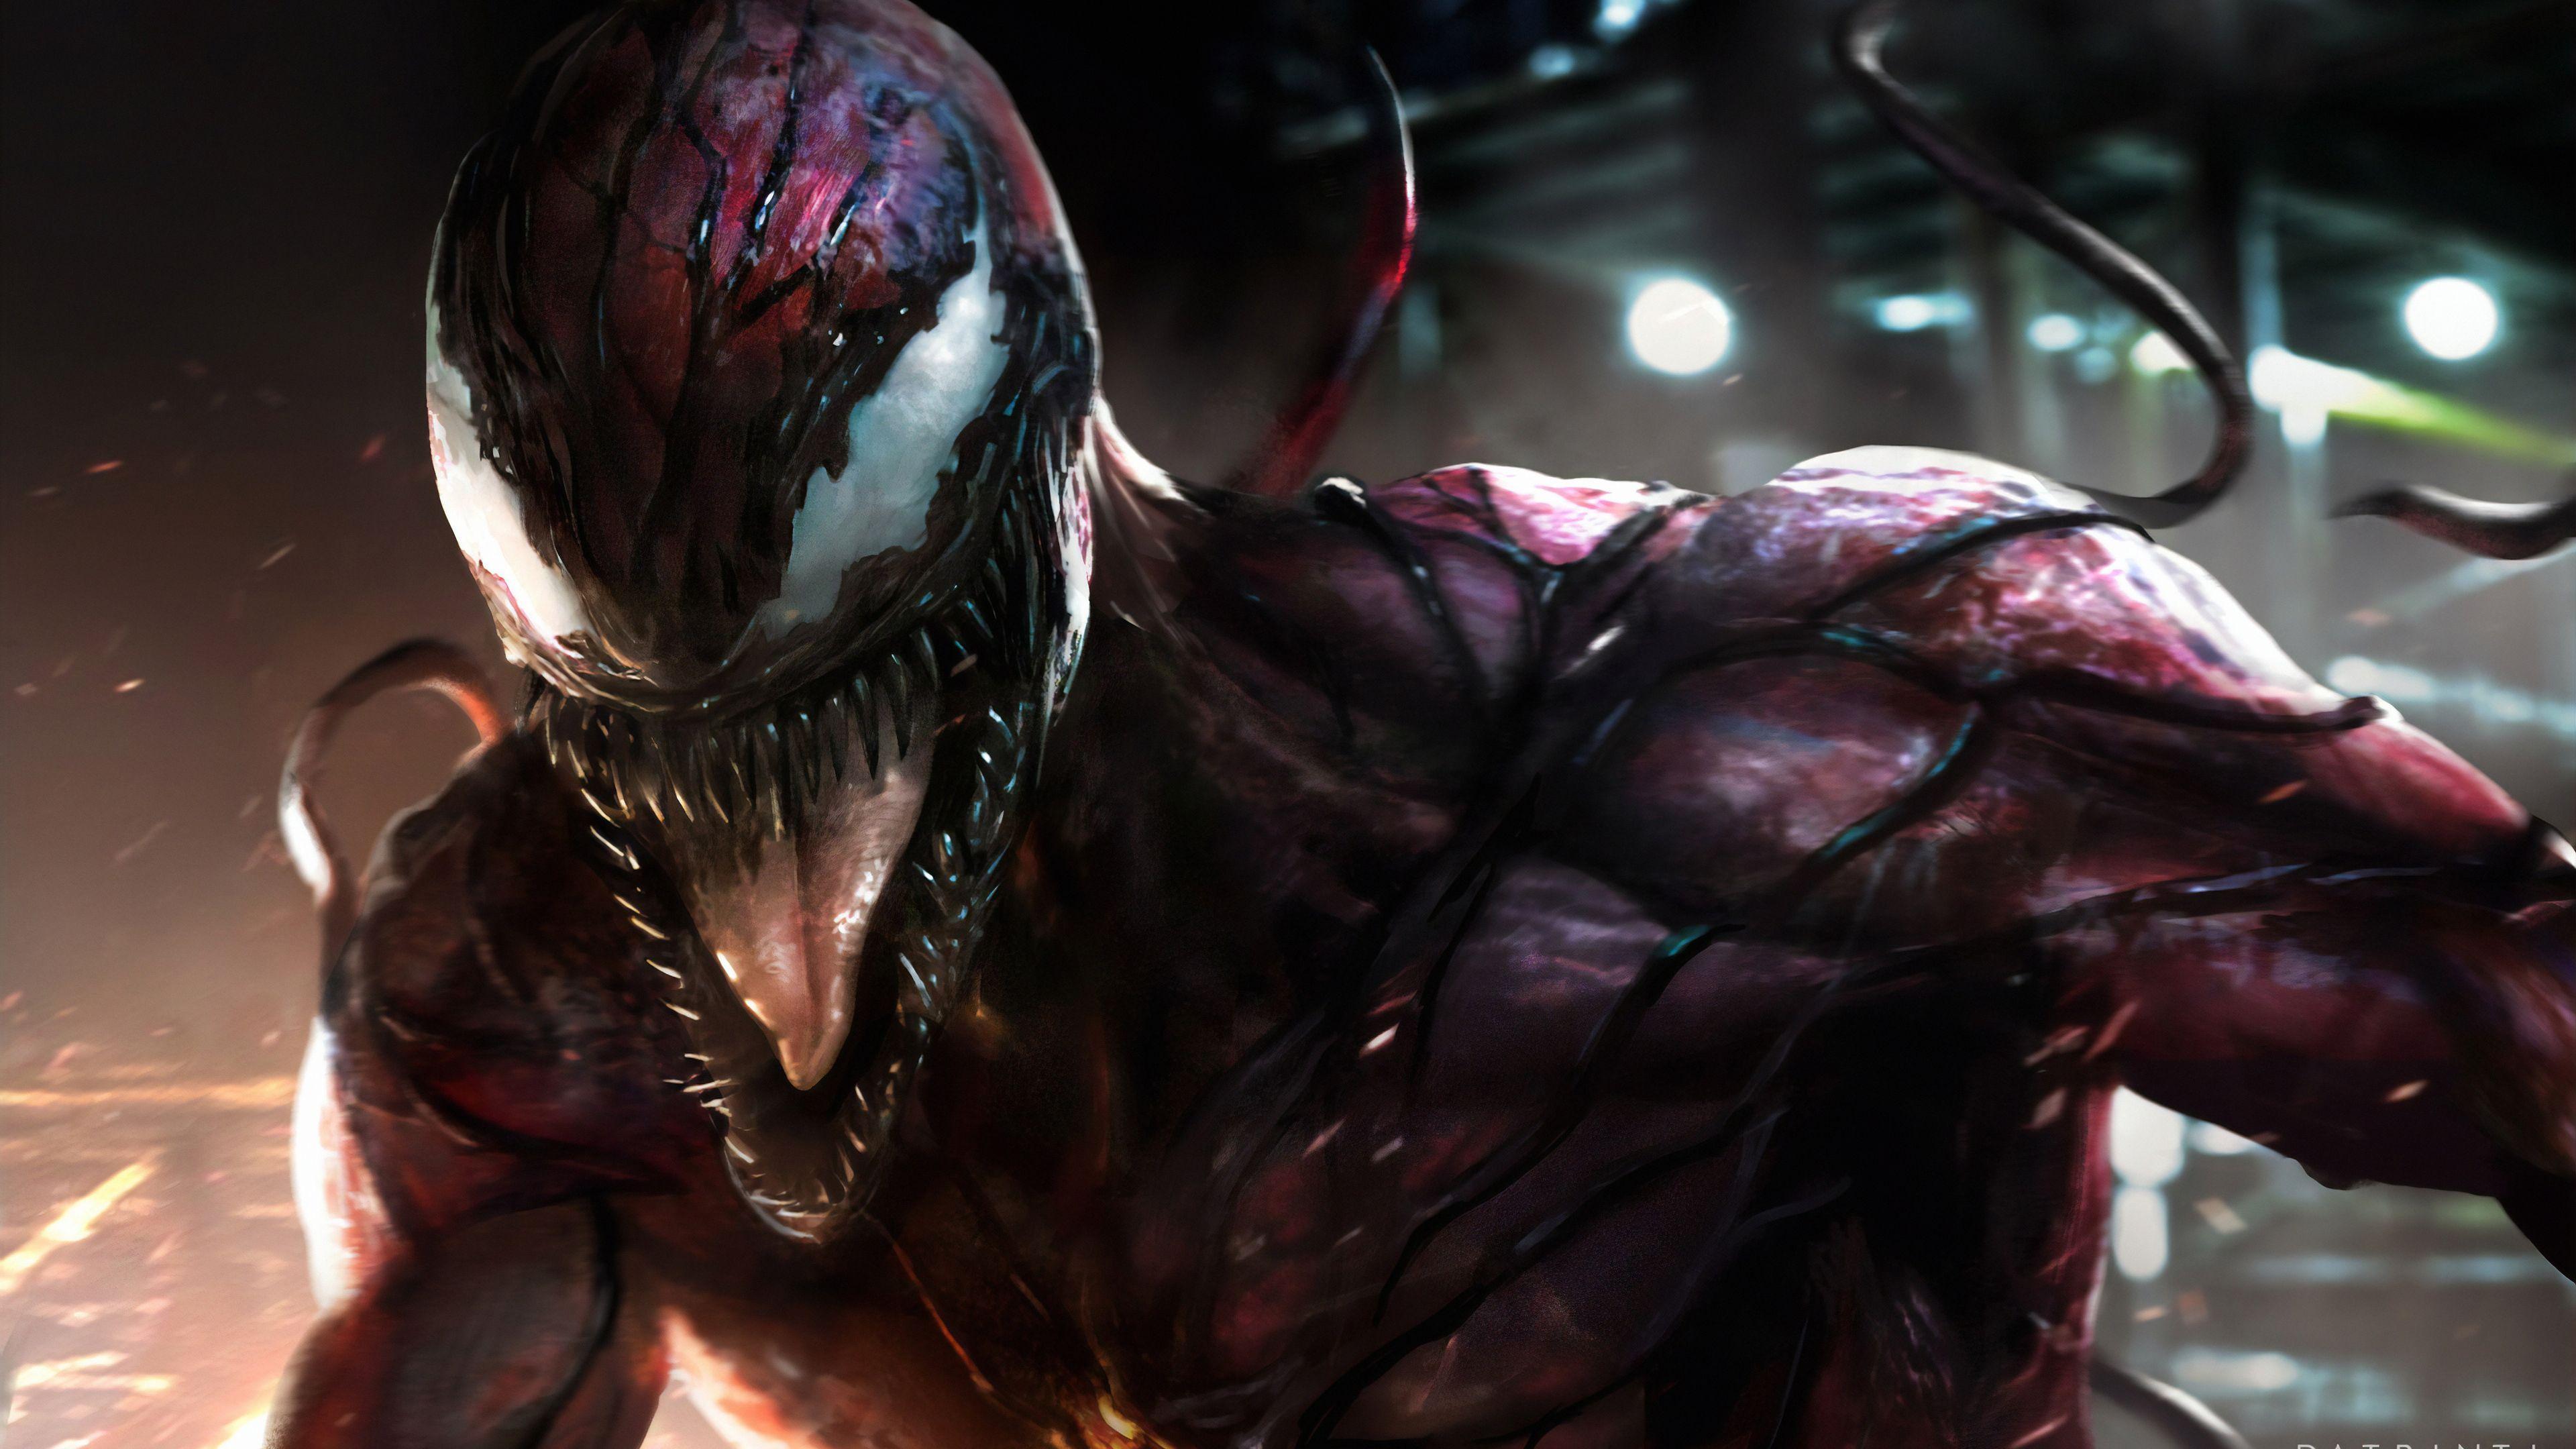 Carnage Superheroes Wallpapers Hd Wallpapers Digital Art Wallpapers Carnage Wallpapers Behance In 2020 Carnage Marvel Carnage Film Venom